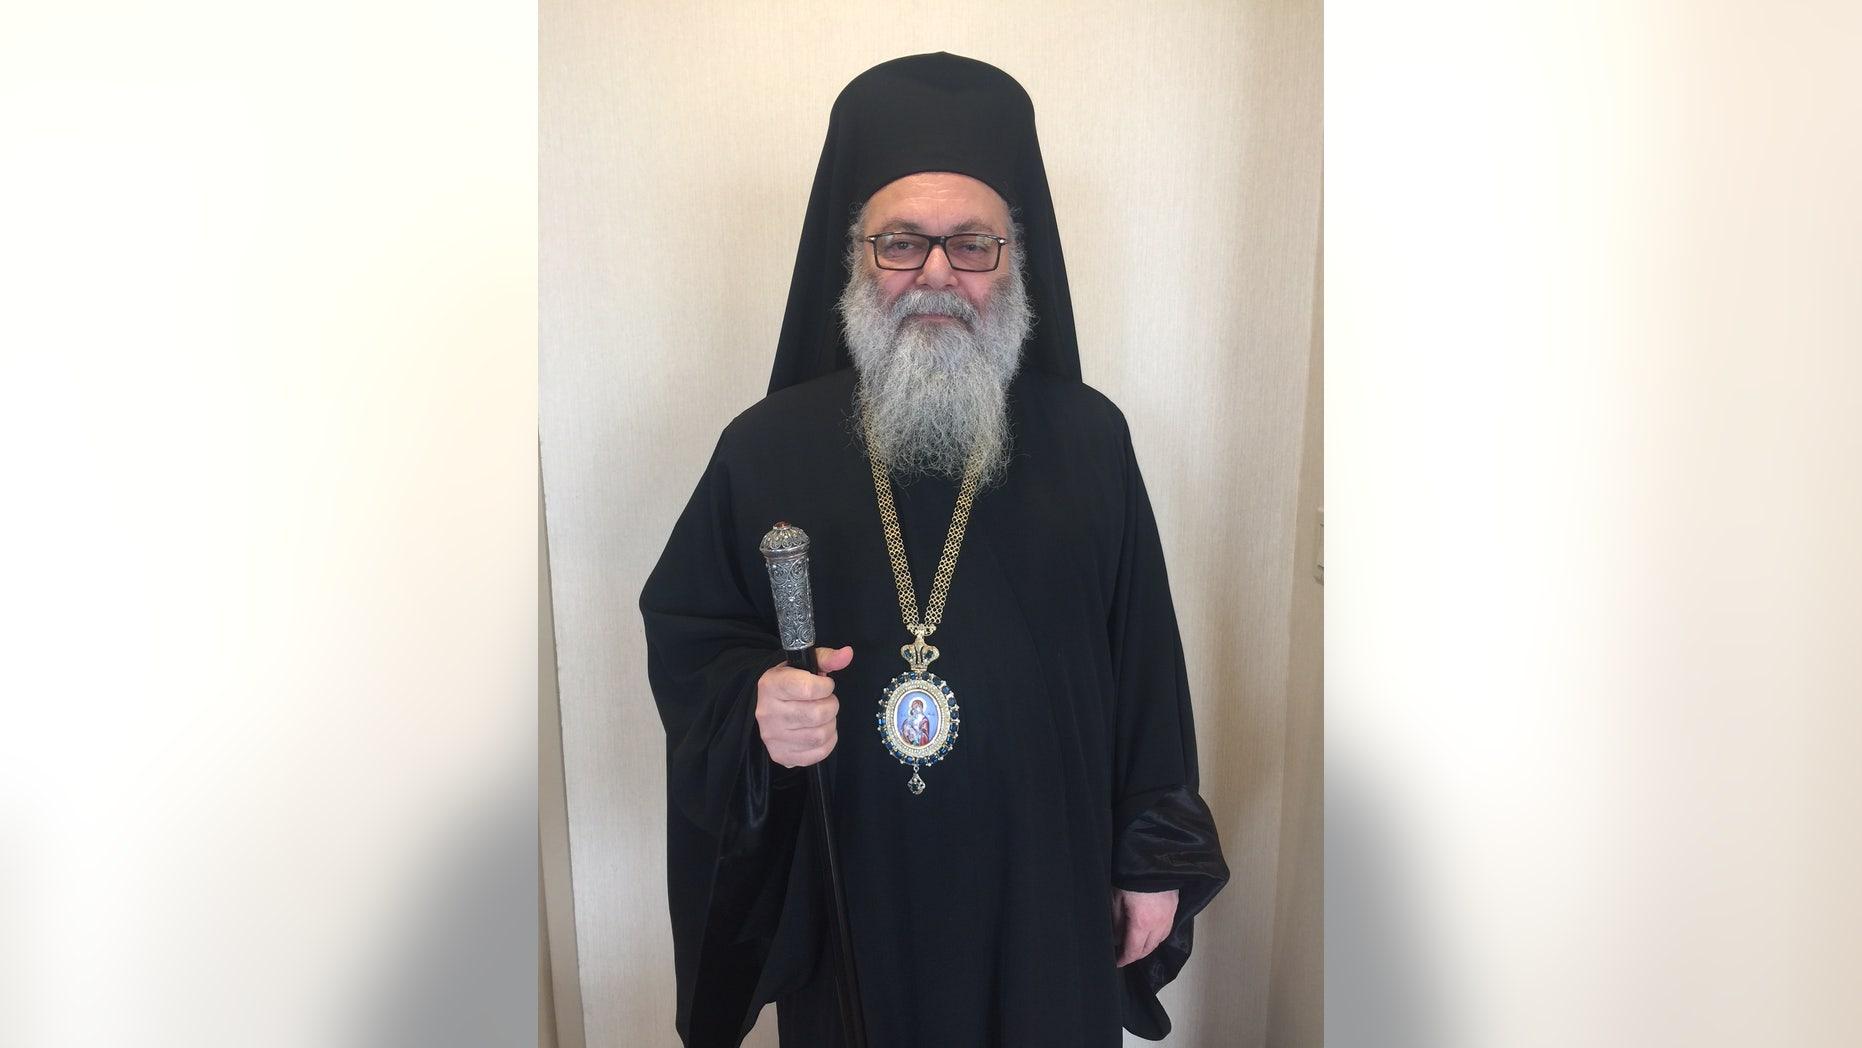 His Beatitude John X, the Damascus-based leader of the Antioch Christian Church